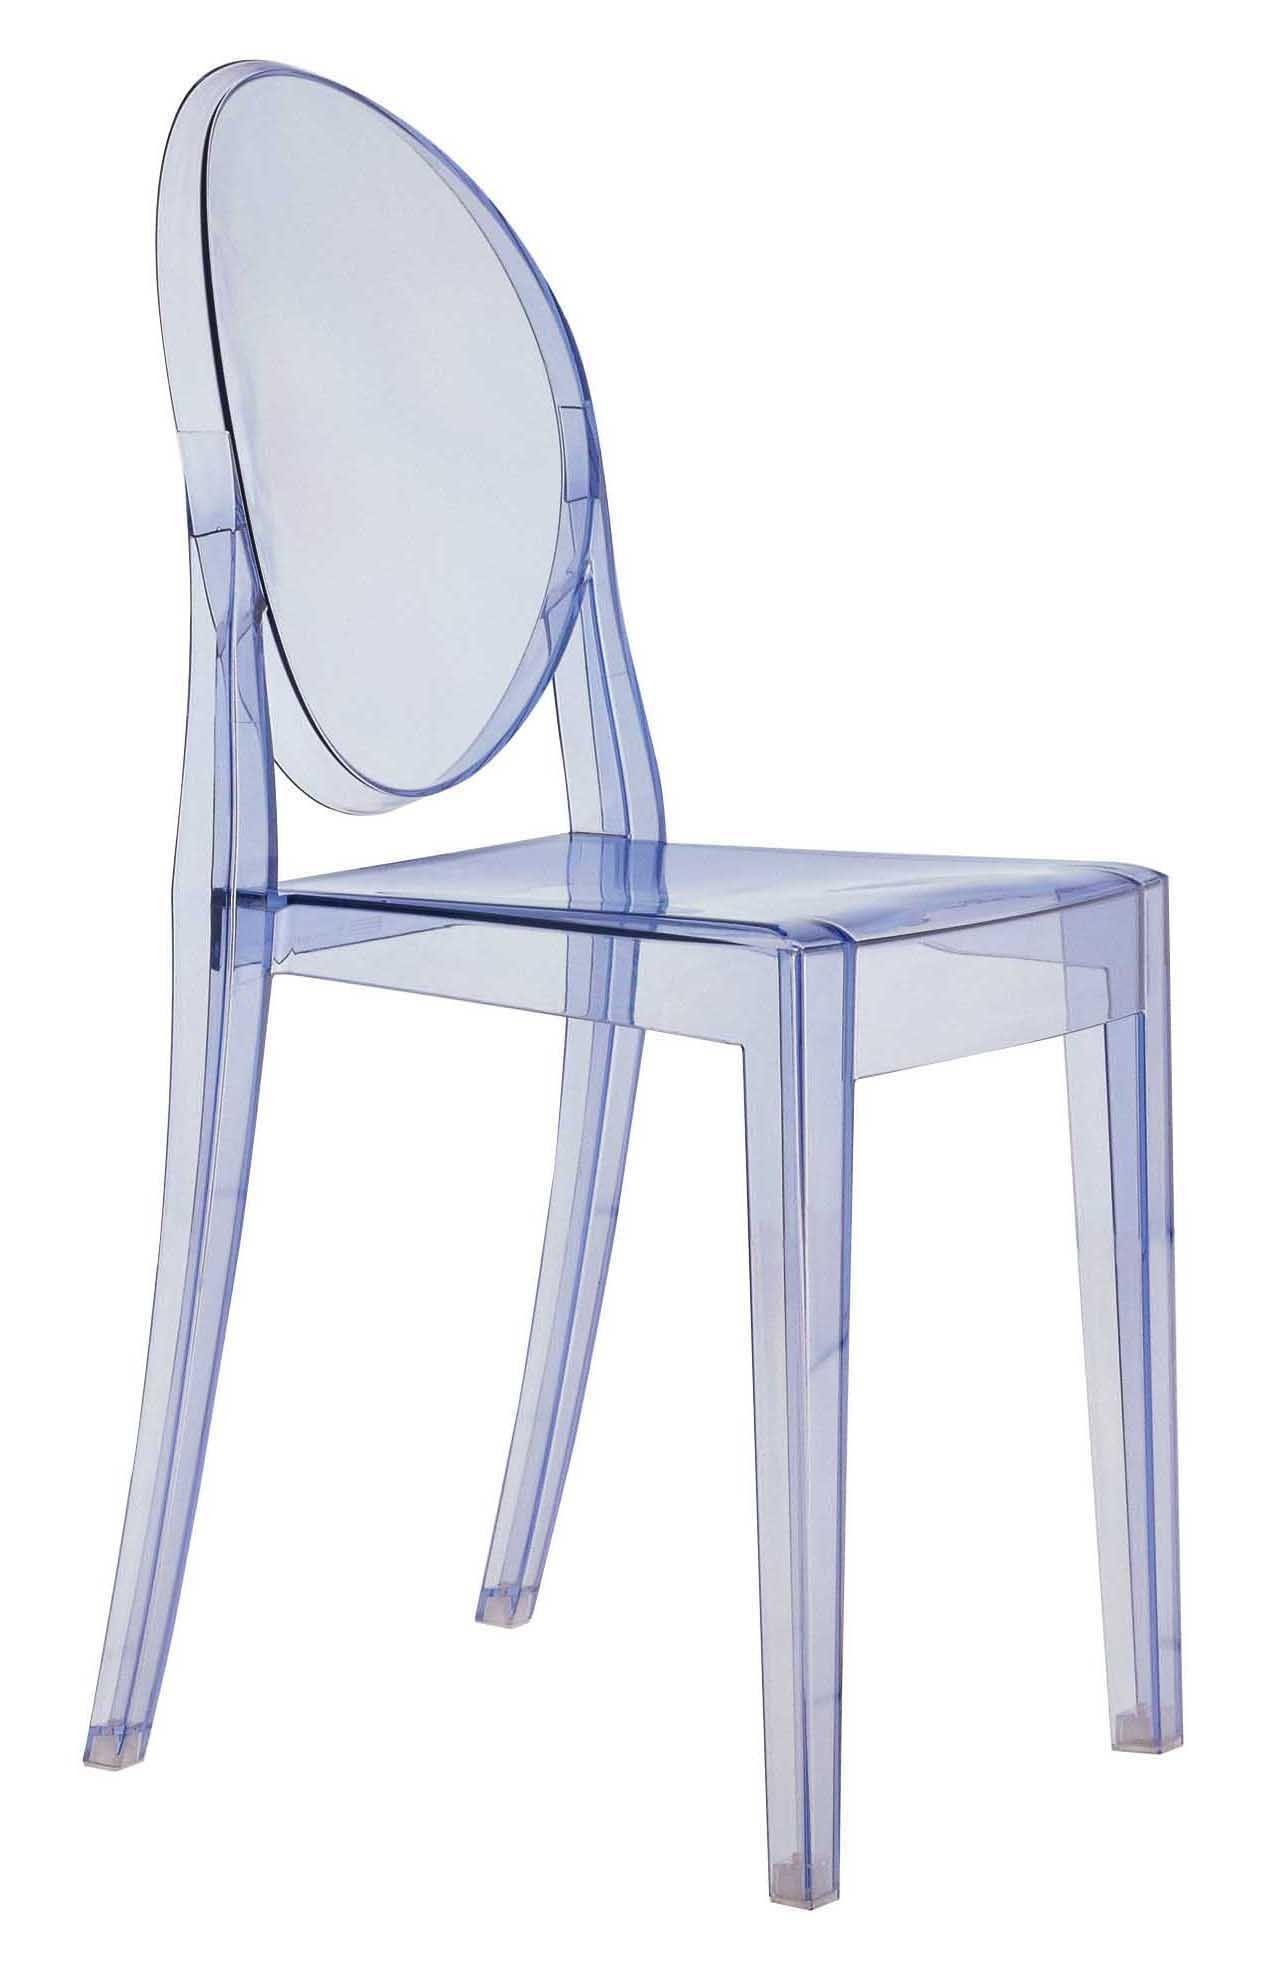 Möbel - Stühle  - Victoria Ghost Stapelbarer Stuhl - Kartell - Himmelblau - Polykarbonat